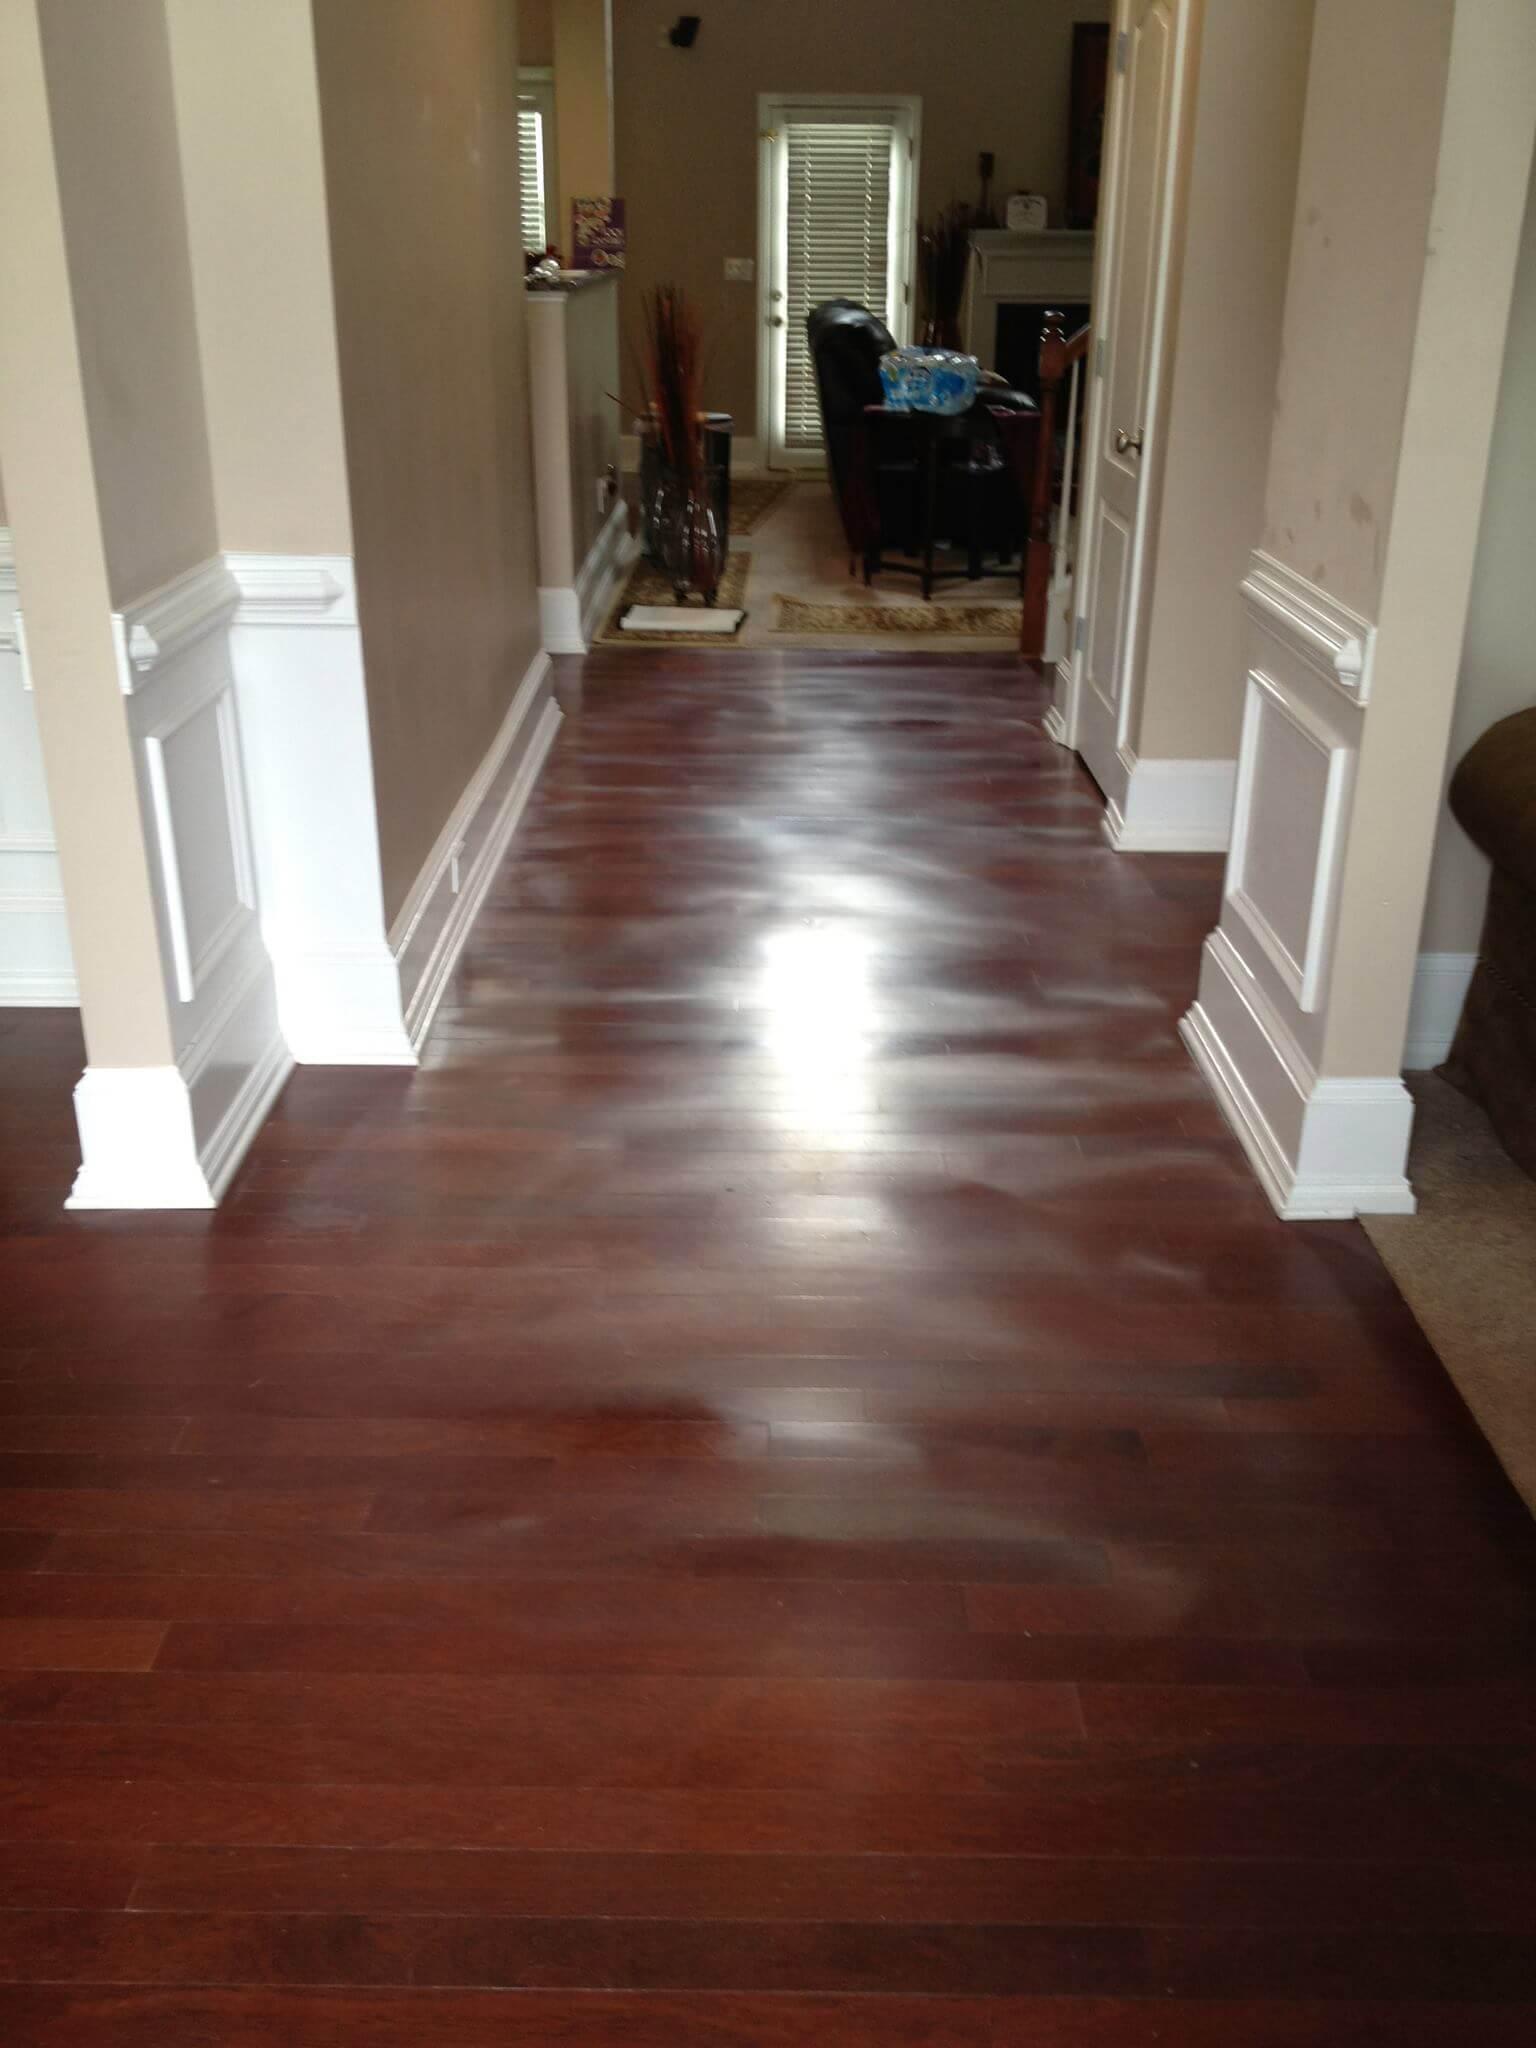 a warped hardwood floor